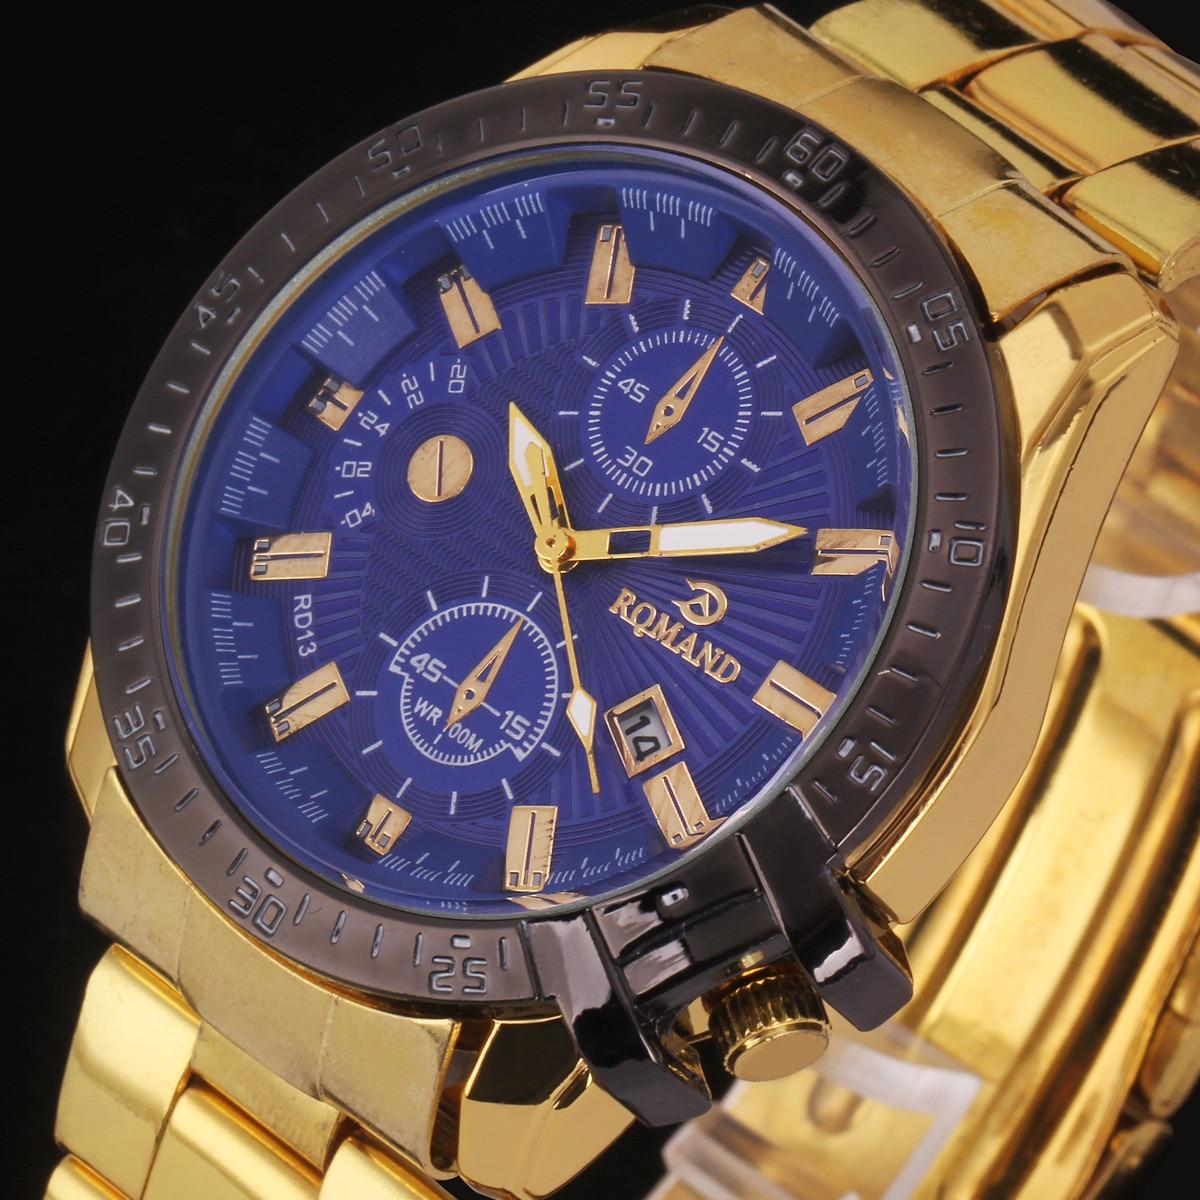 2016 Mens Black Dial Gold Stainless Steel Date Analog Sport Quartz Watch Luxury Brand Wristwatch Relogio Masculino Relojes#77 xiniu men s fashion luxury watch stainless steel sport analog quartz mens wristwatch